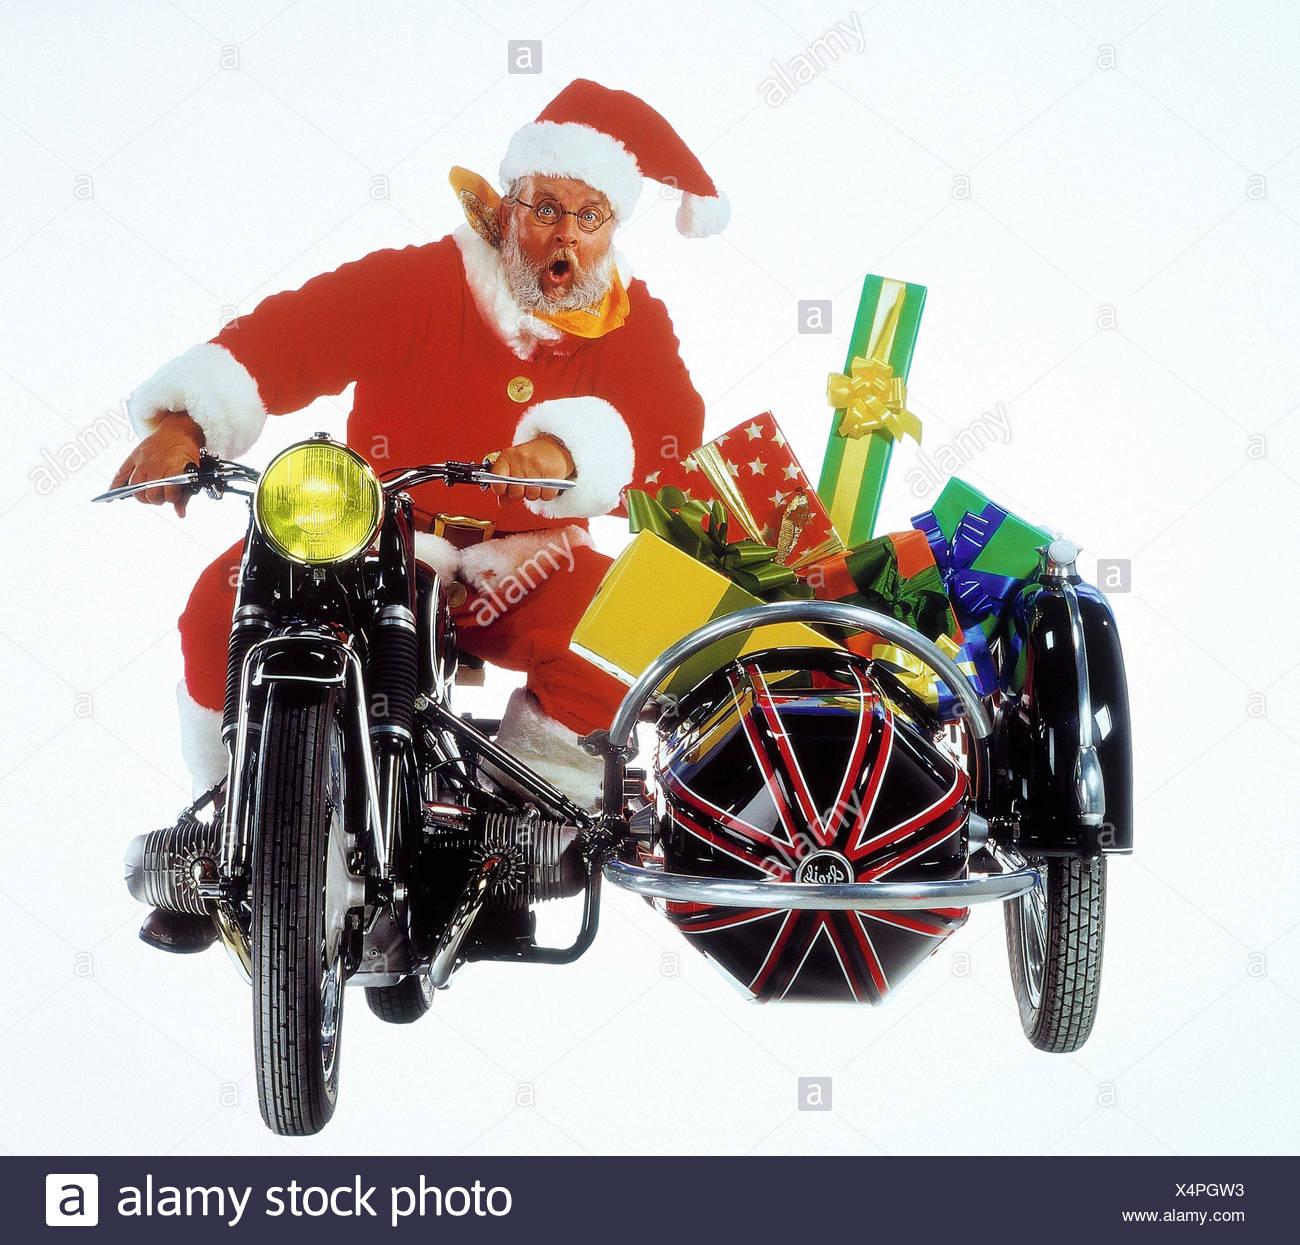 Santa Claus, motorcycle, side car, presents, deliver Christmas, distribution presents, Santa, motorcycle driving, sidecar, Christmas presents, deliver, transport, facial play, fright, studio, cut out - Stock Image